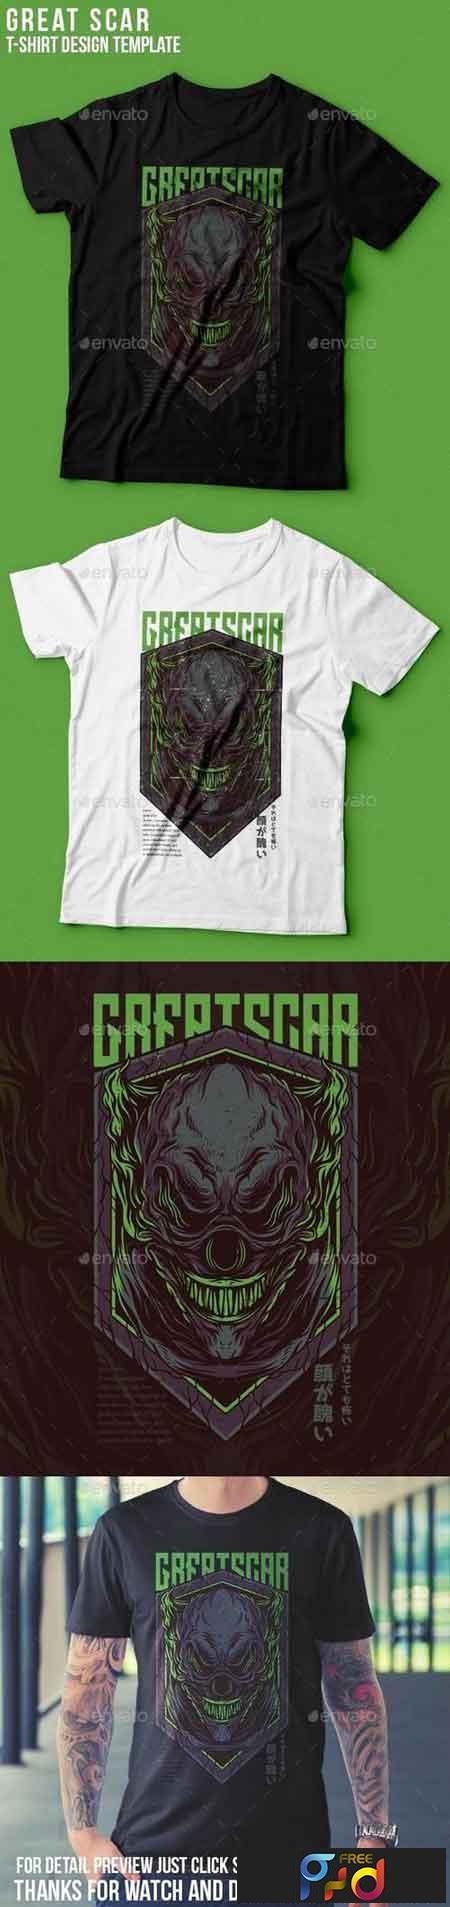 Great Scar T-Shirt Design 22939359 1